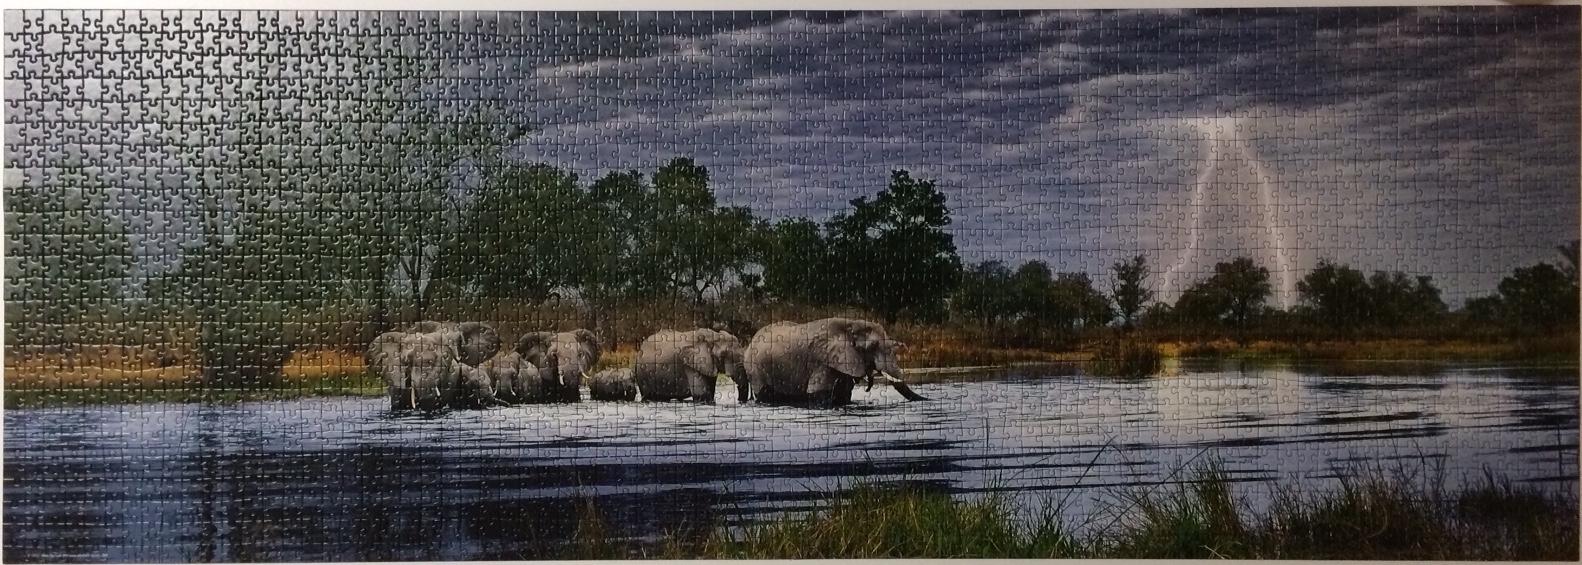 Brand: Heye, Panorama, 2012  Title: Herd of Elephants puzzle  Size: 54